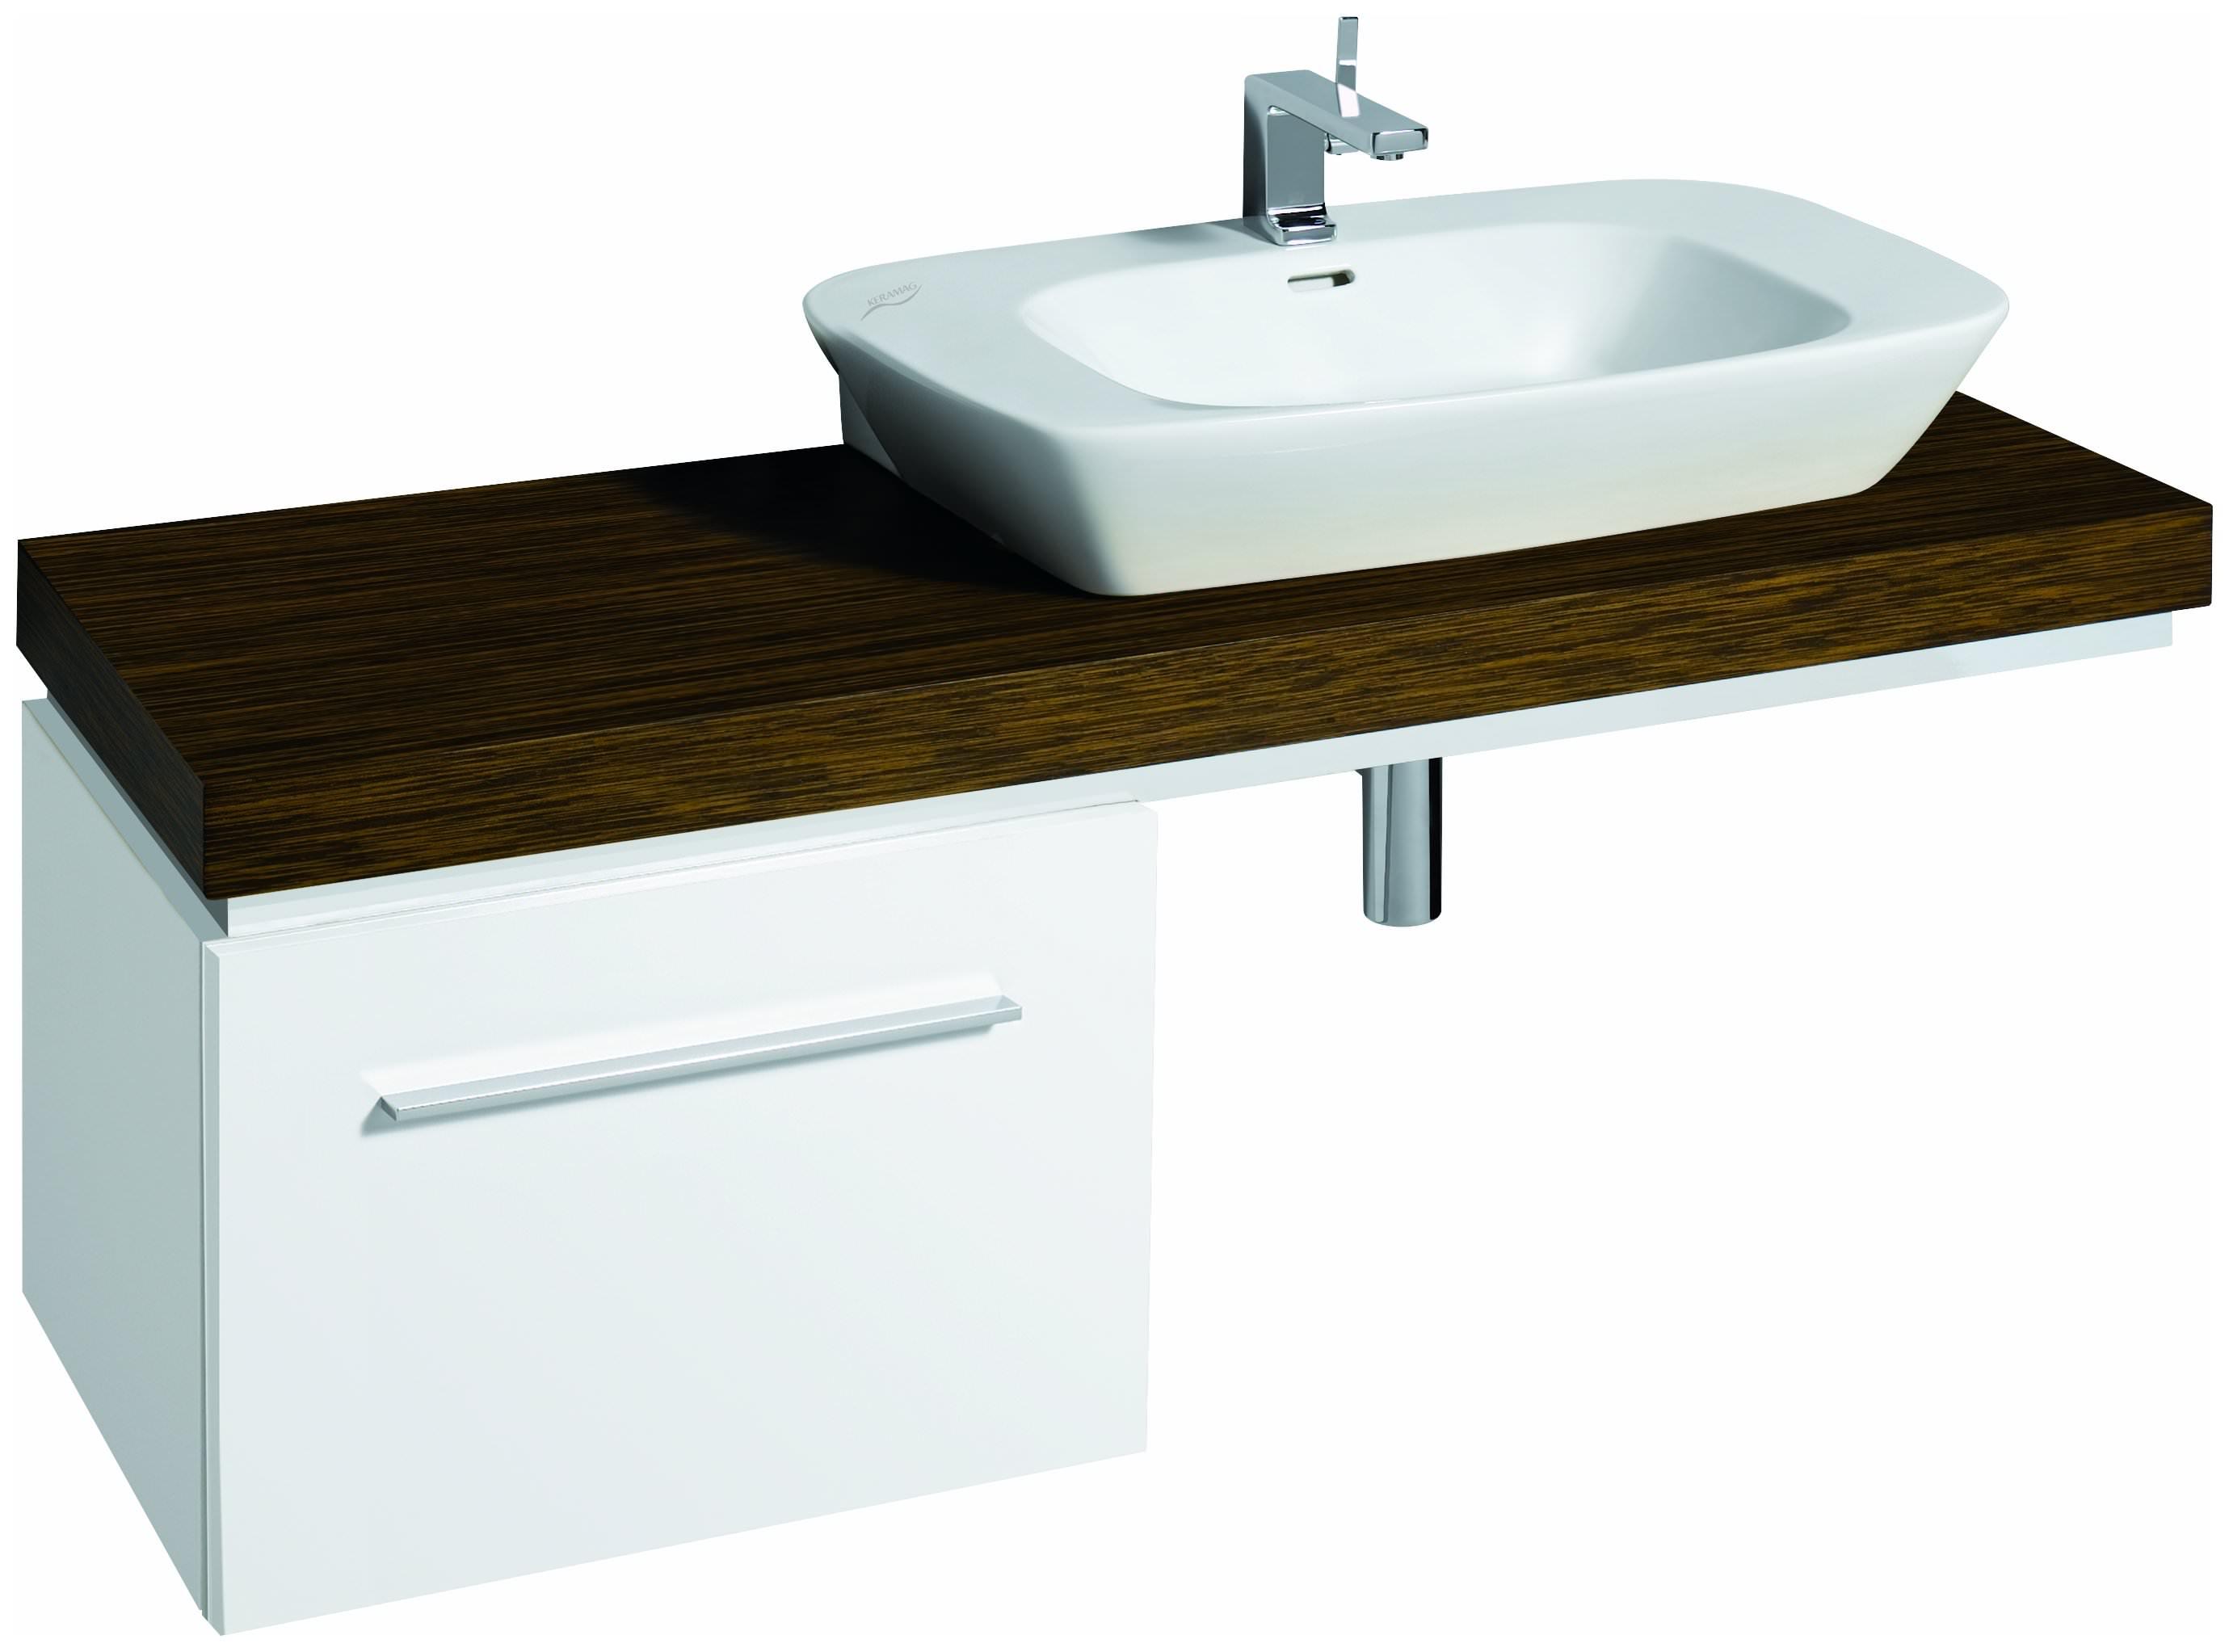 keramag silk waschtisch 800mm x 470mm wei alpin 121680000. Black Bedroom Furniture Sets. Home Design Ideas